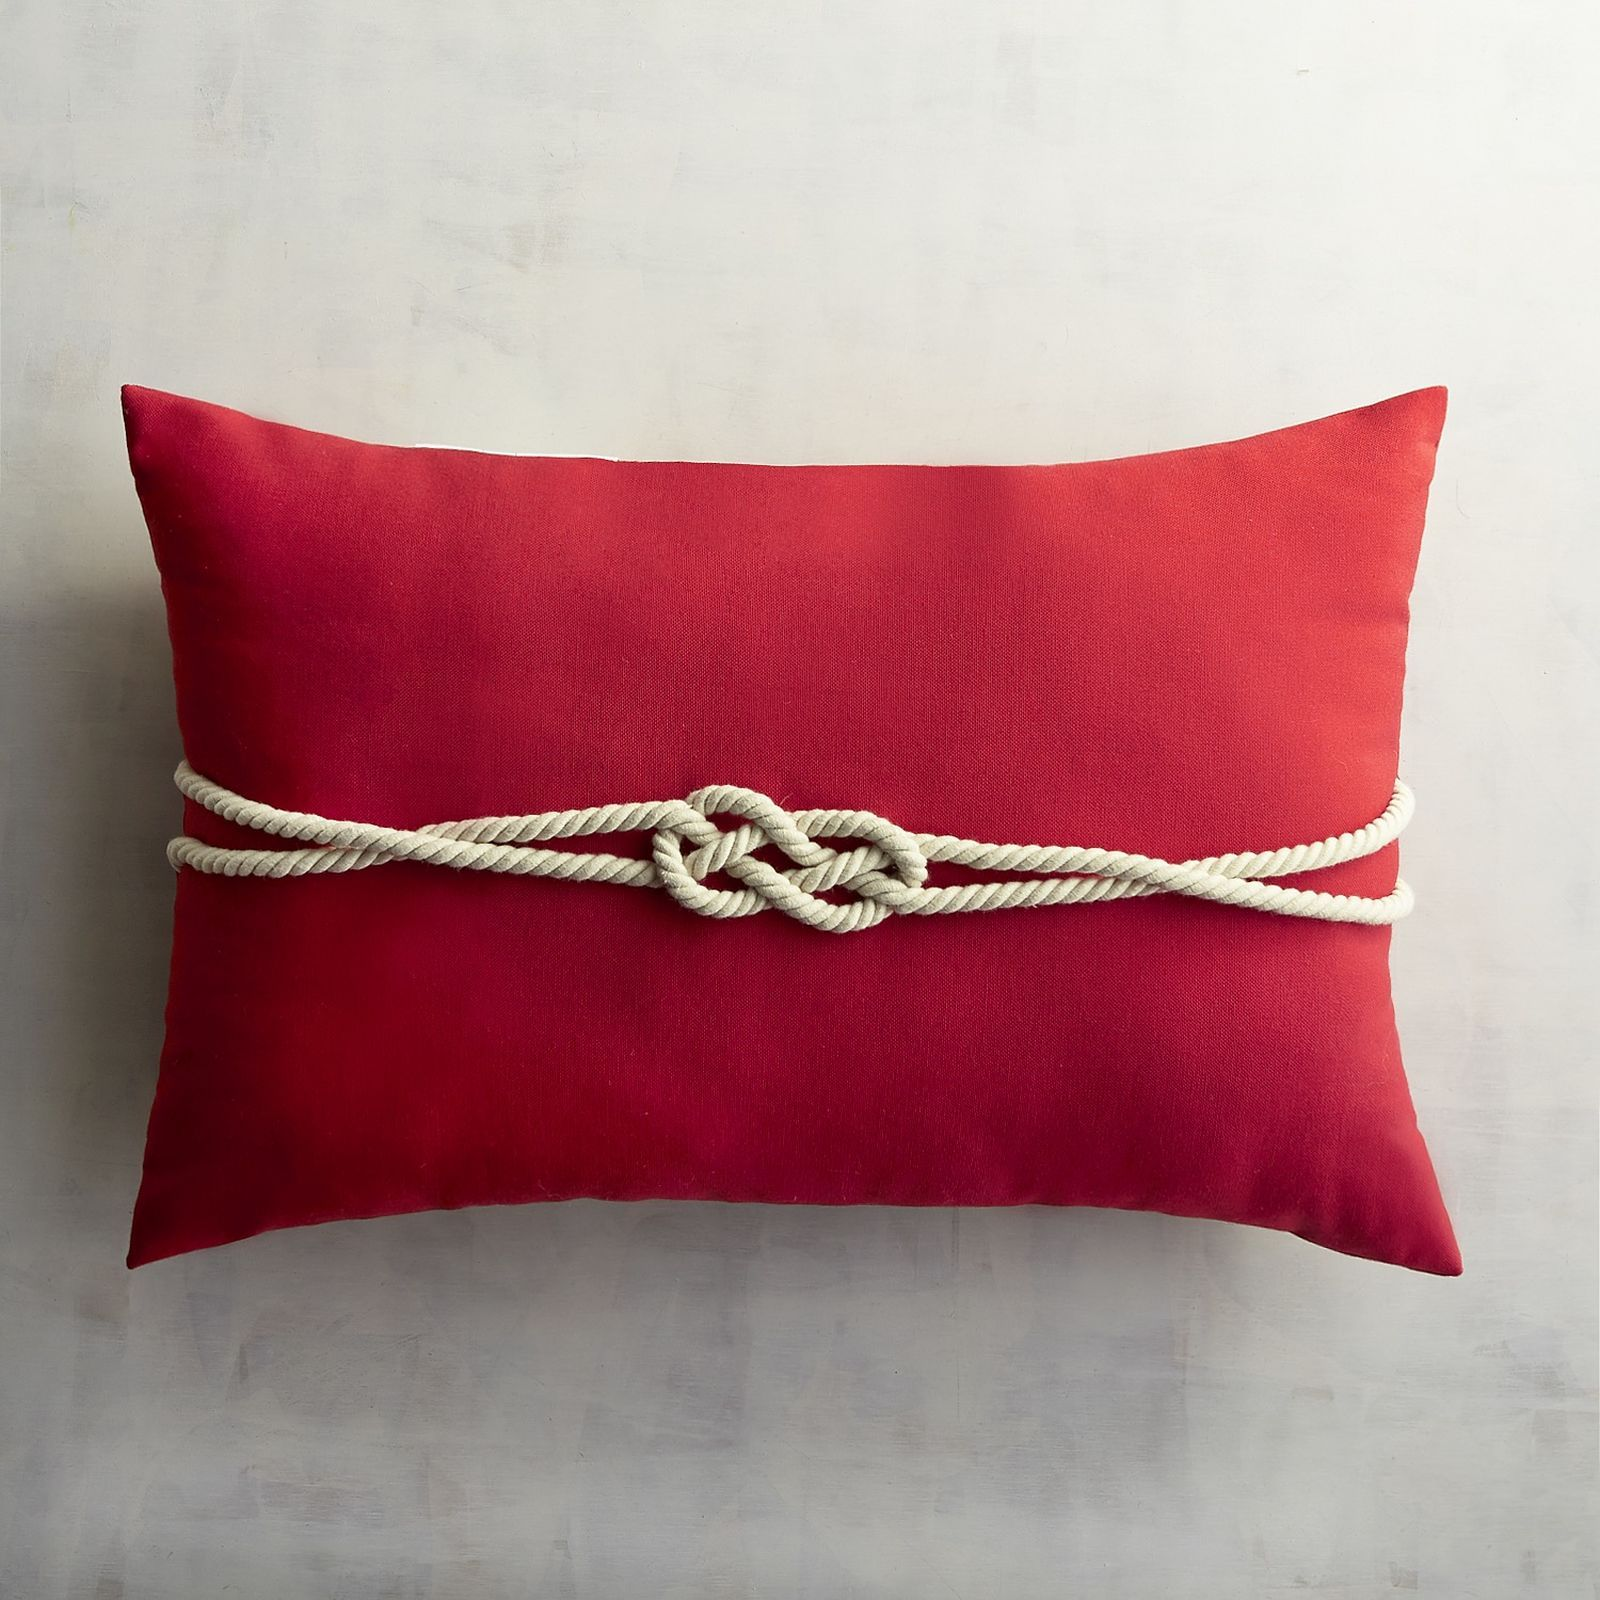 Pier 1 Imports Tomato Rope Lumbar Pillow